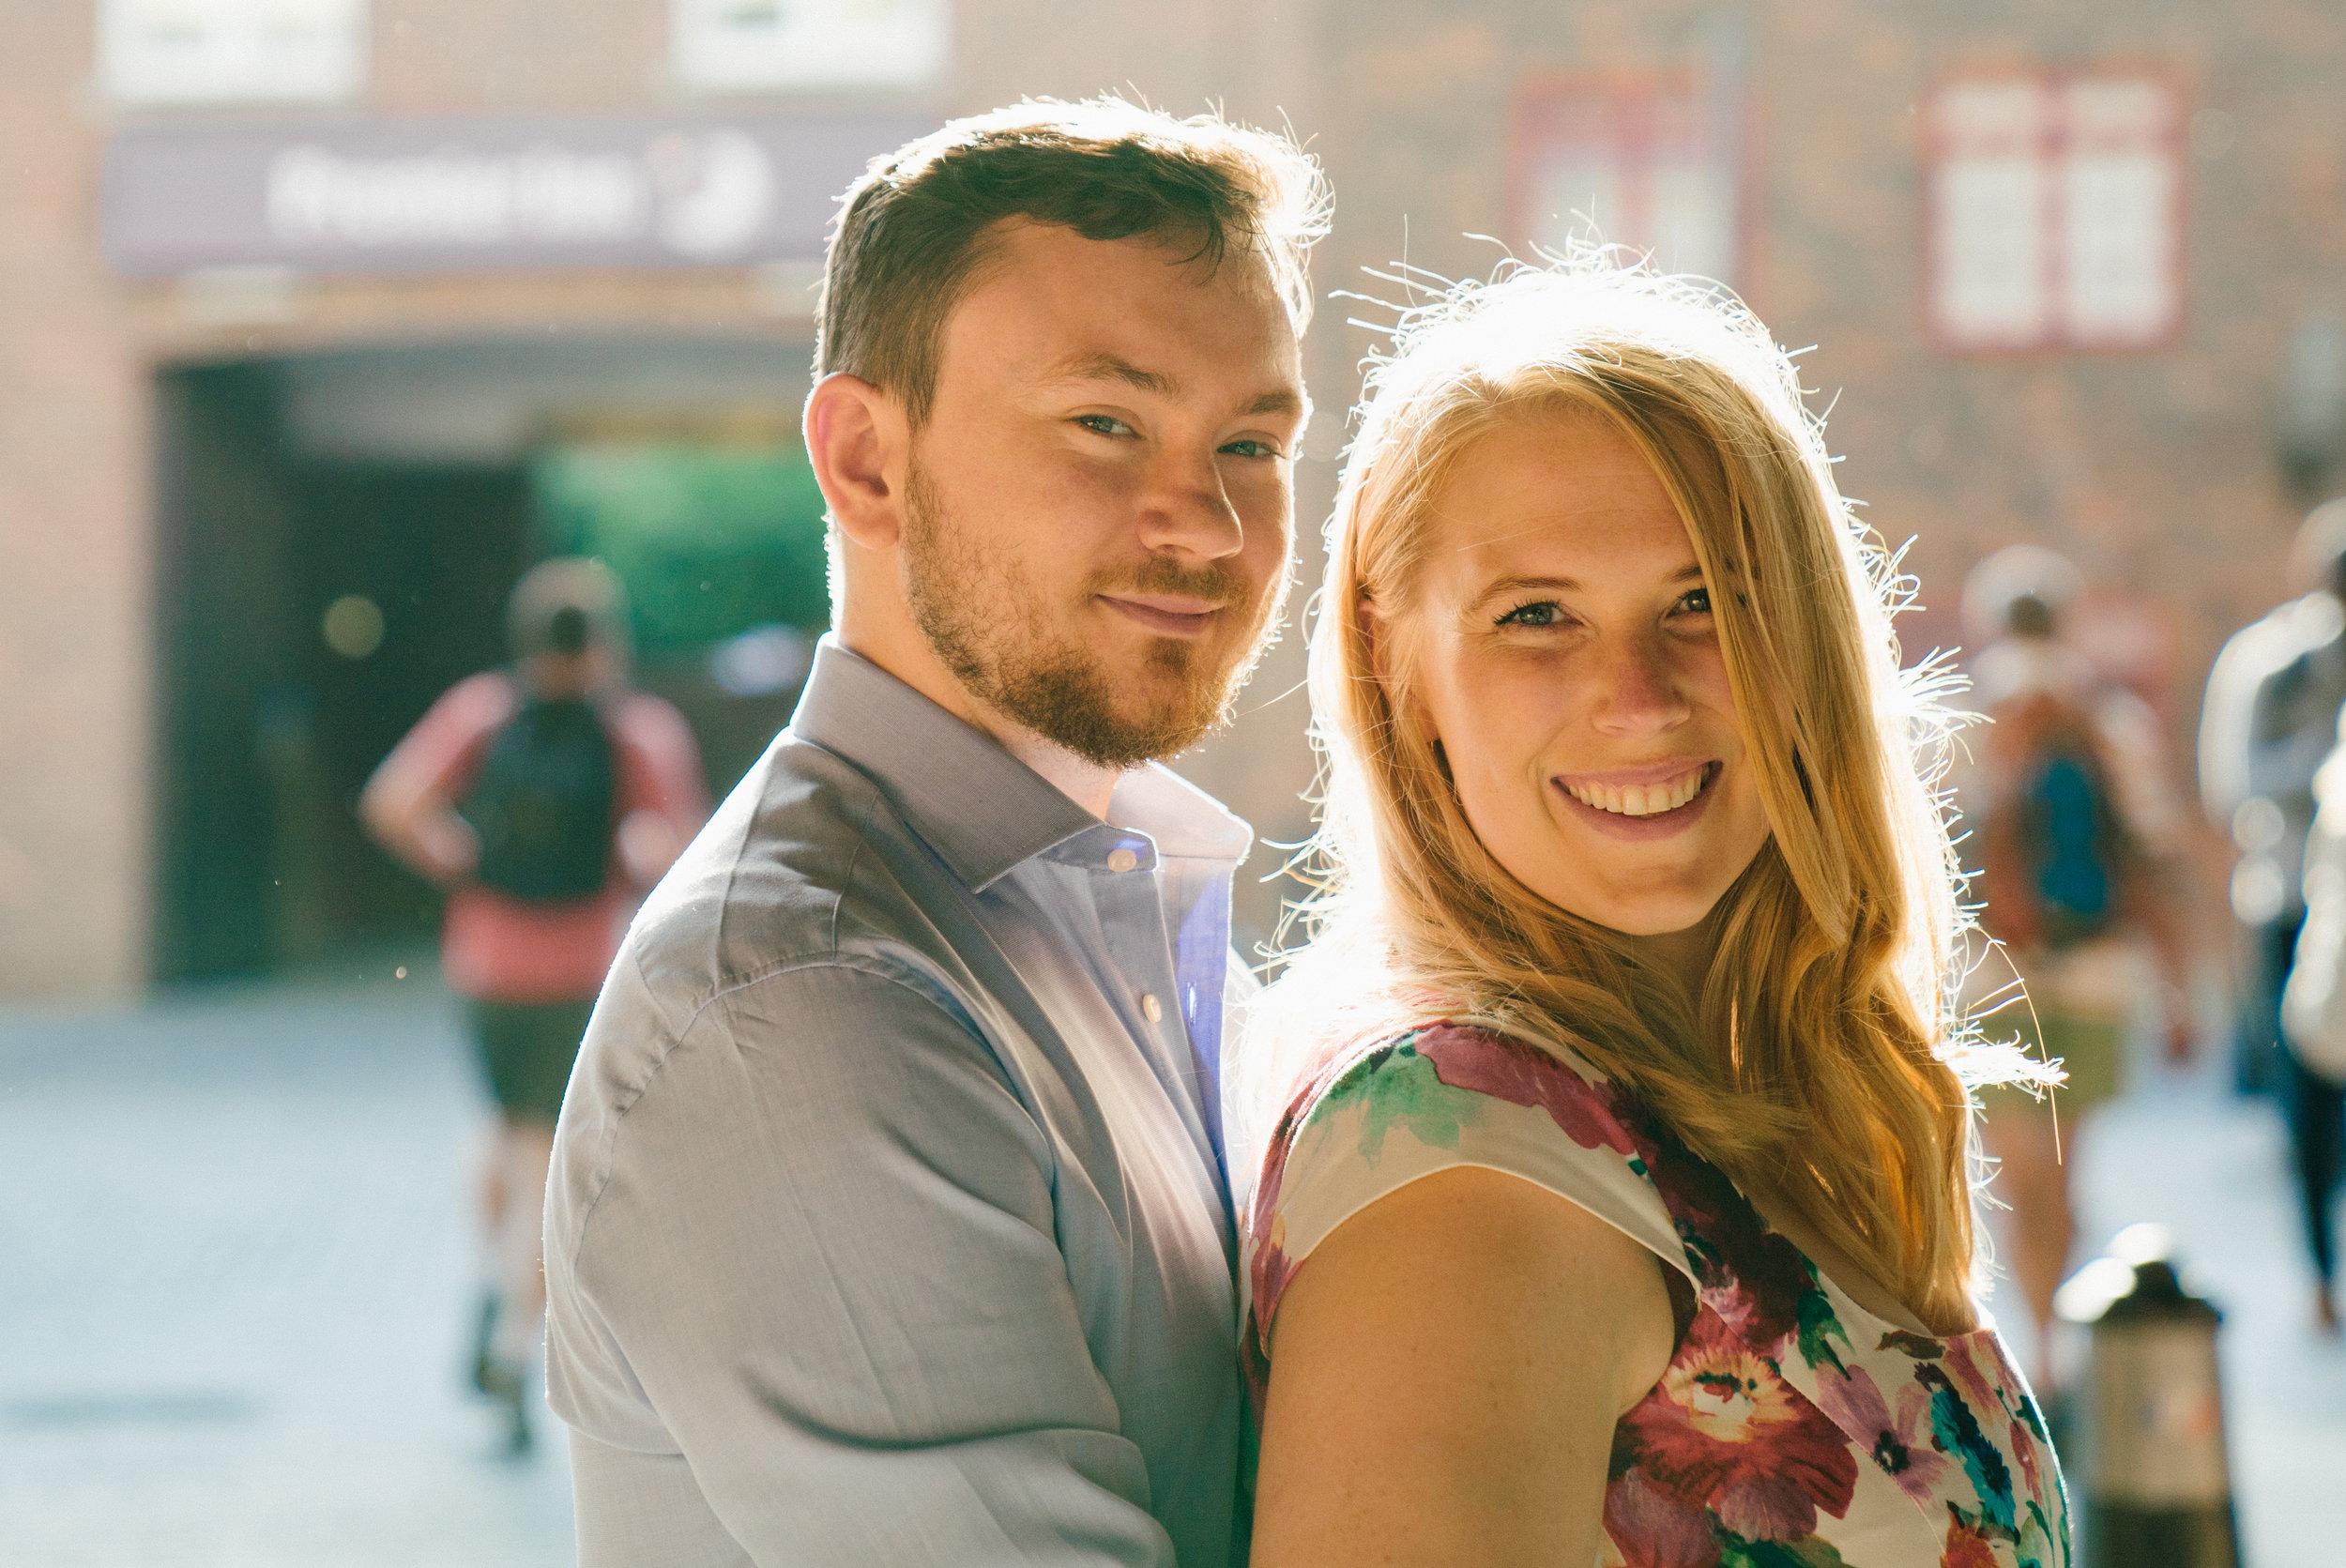 globe-theatre-blackfriars-bridge-engagement-wedding-london-photography-videography-04